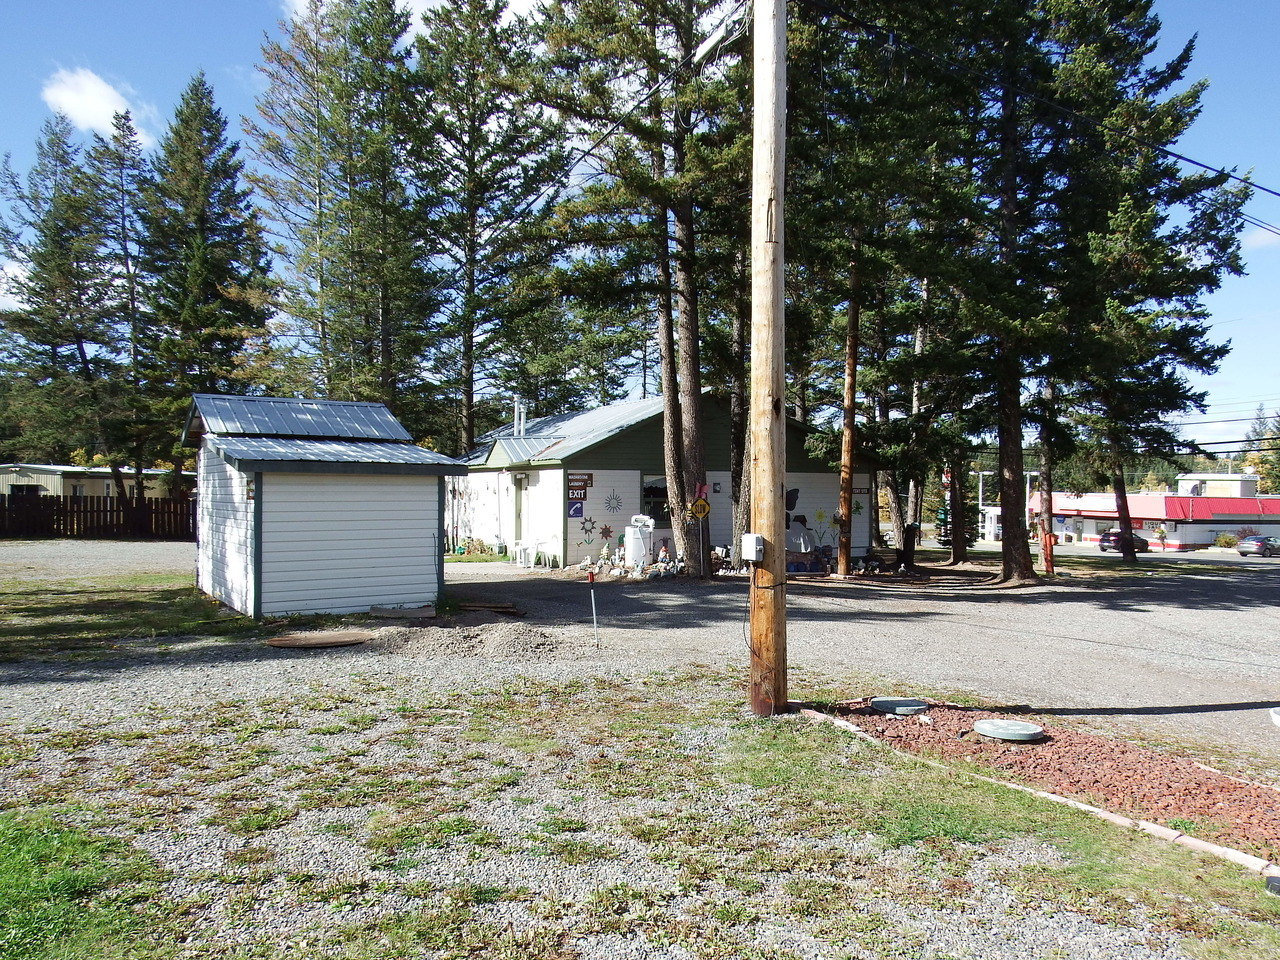 Wildwood Campsite RV Park 1 9